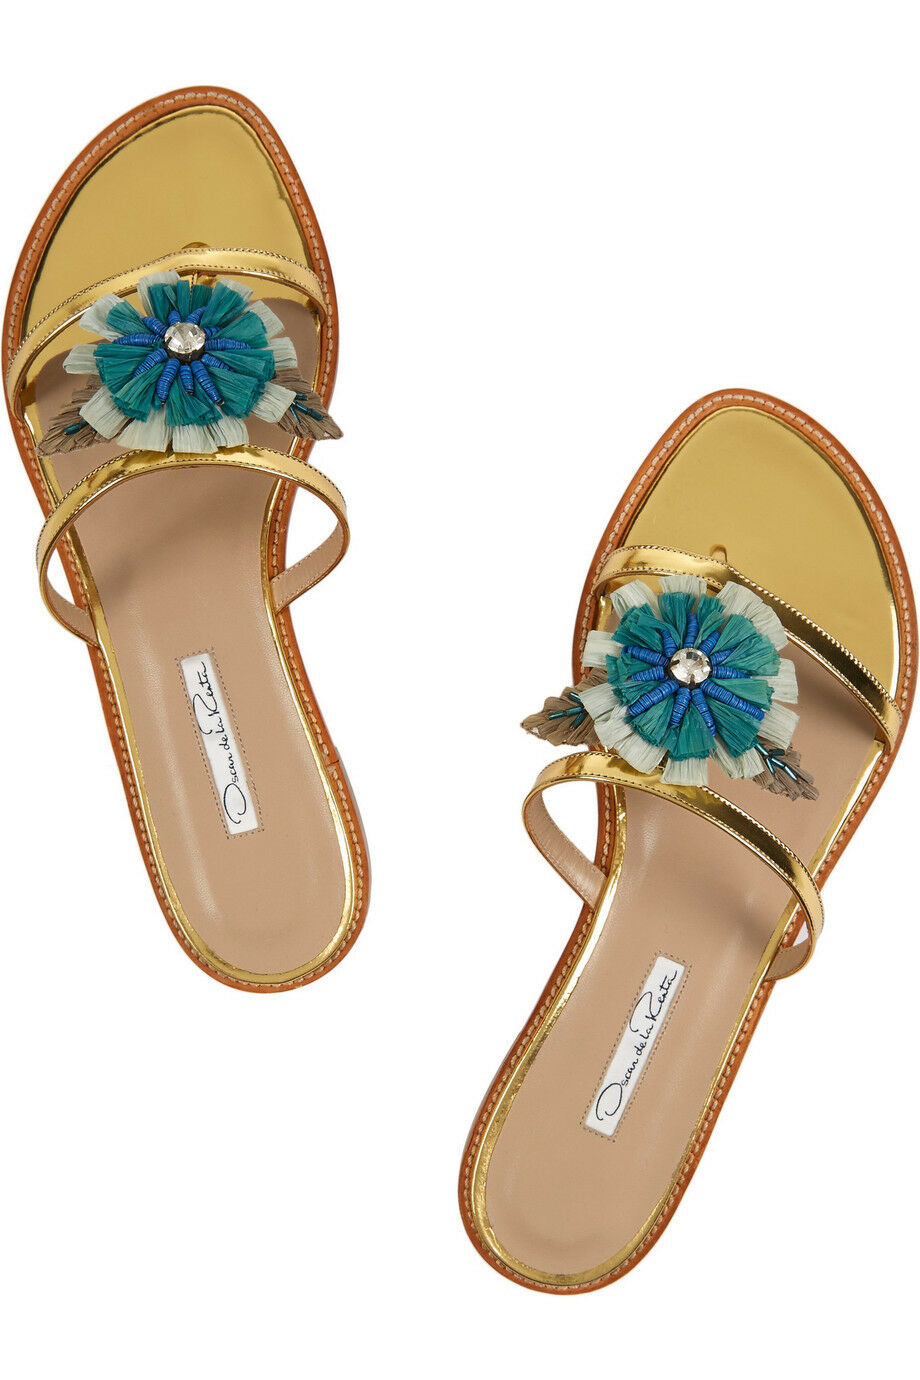 NEW OSCAR De La RENTA Wissy Flo Embellished Patent gold Flats SANDALS 40 40.5